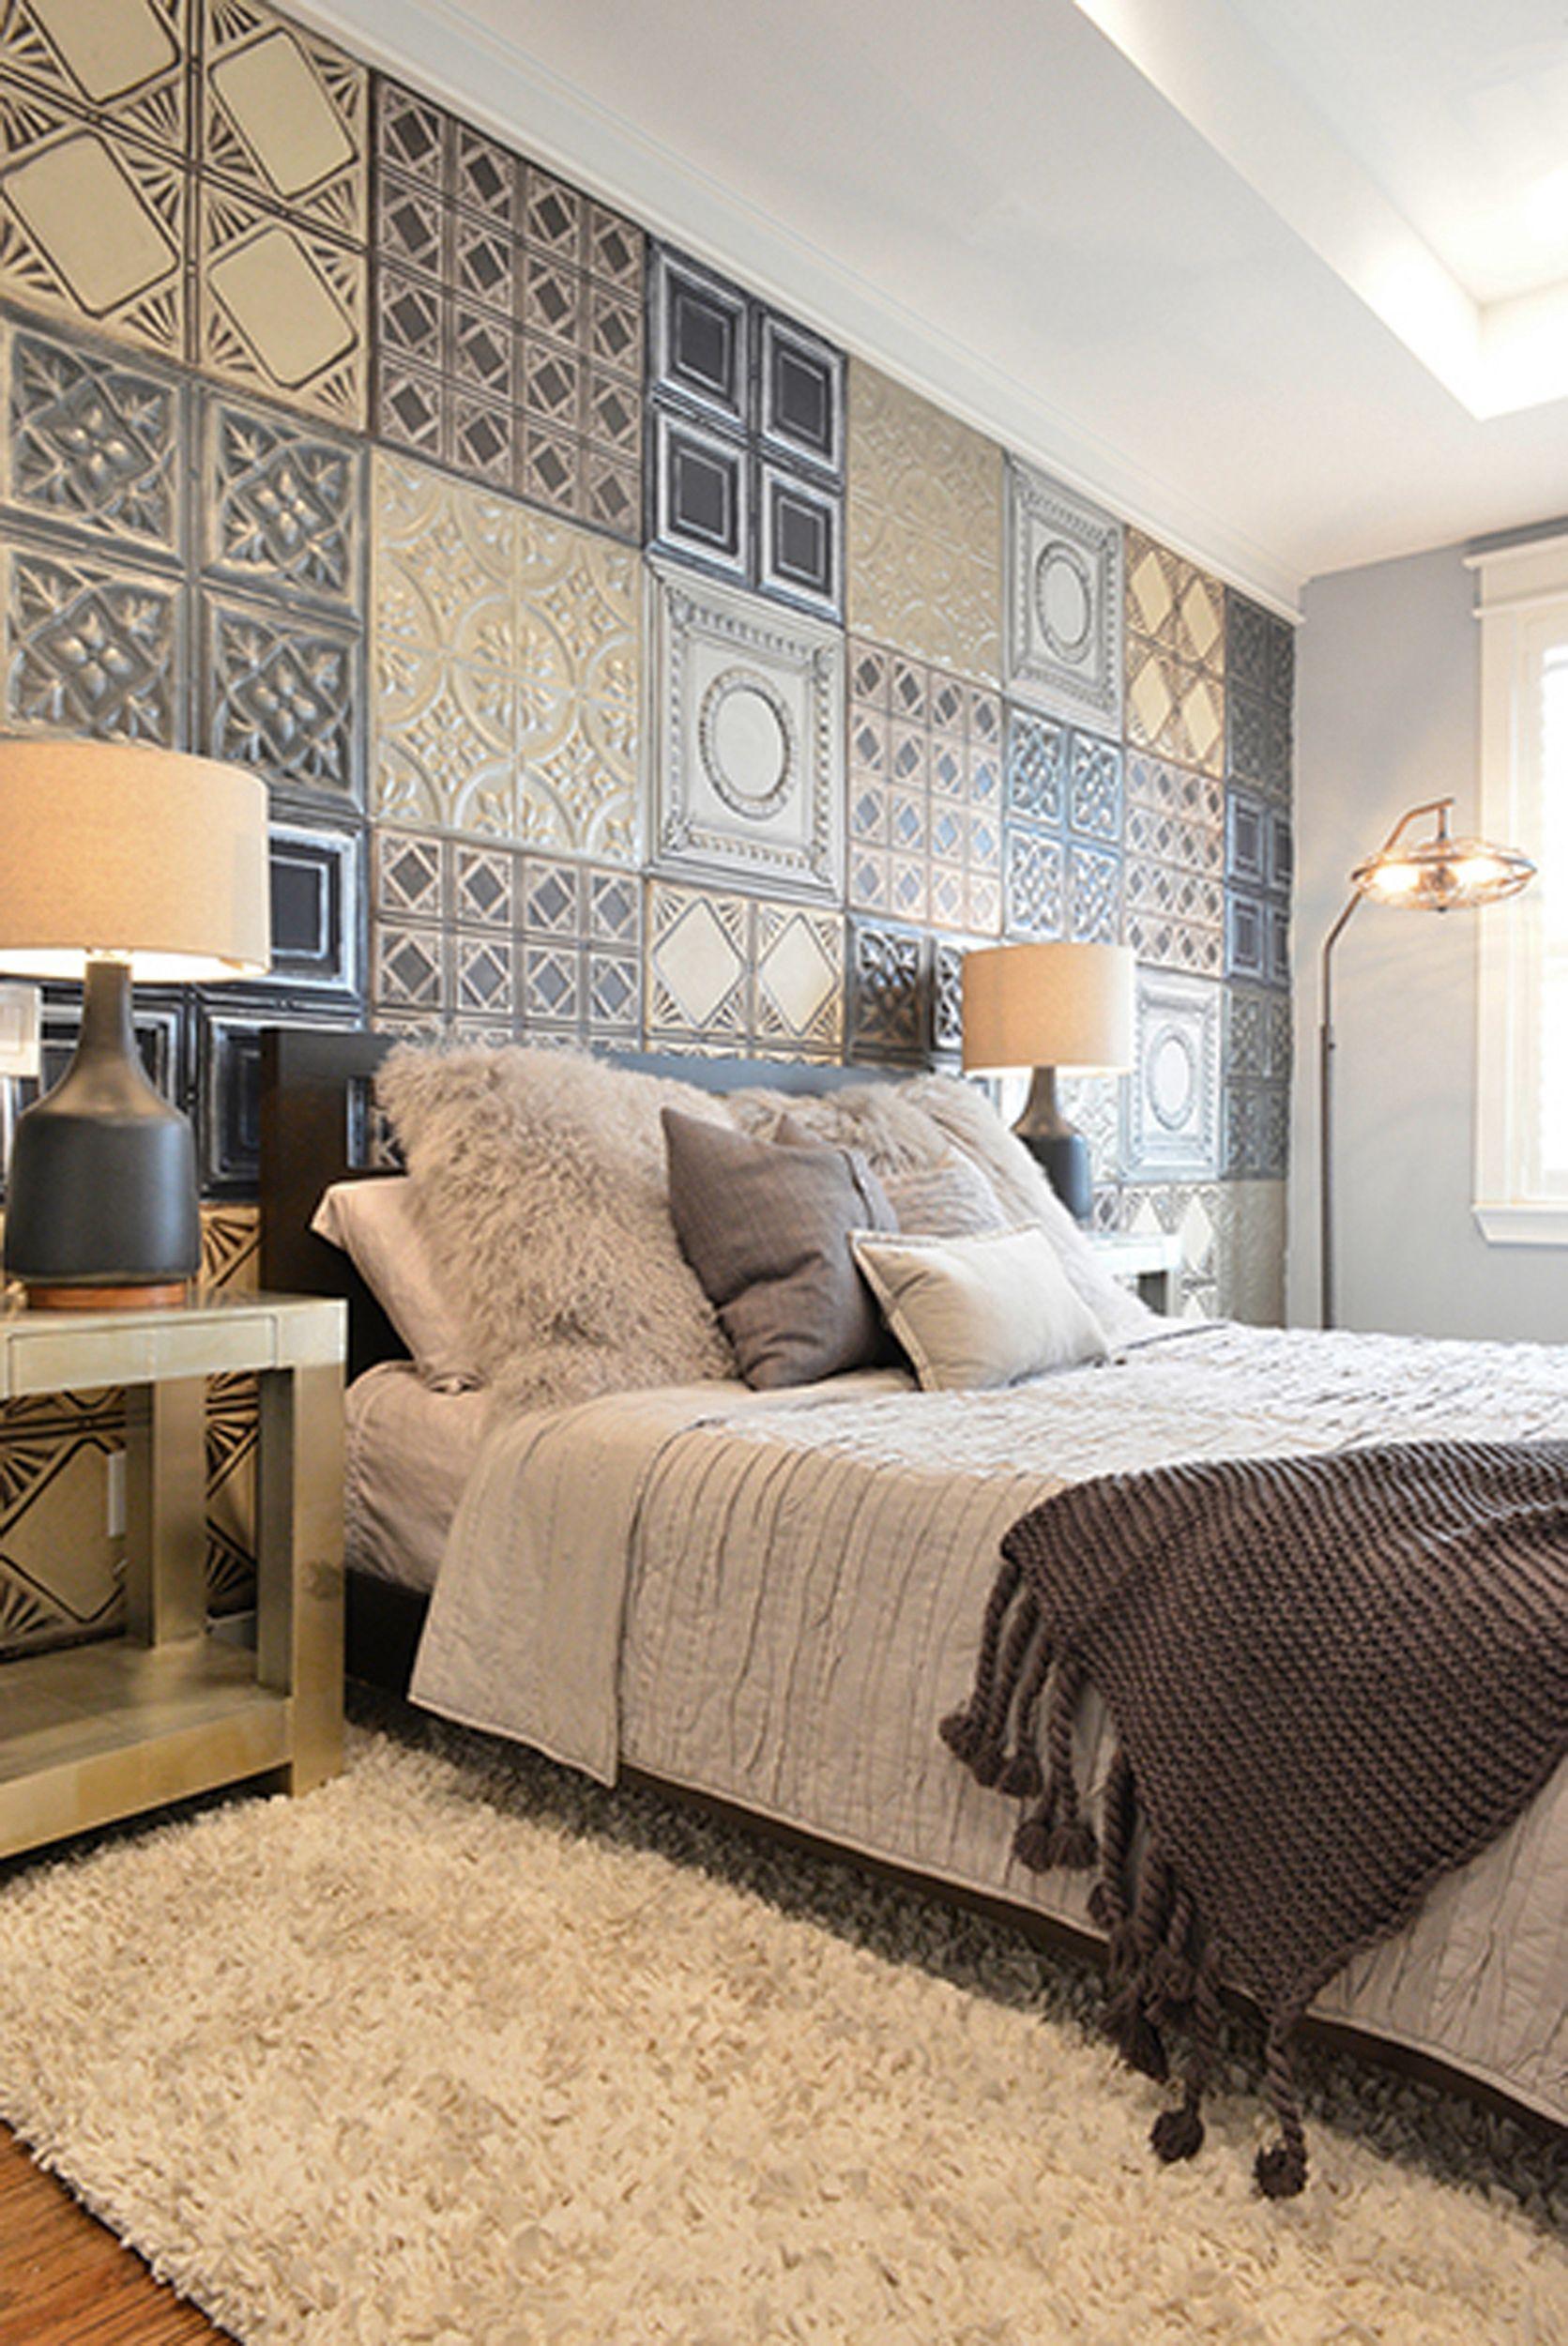 Feature Wall Master Bedroom Interior Master Bedroom Interior Design Accent Wall Bedroom